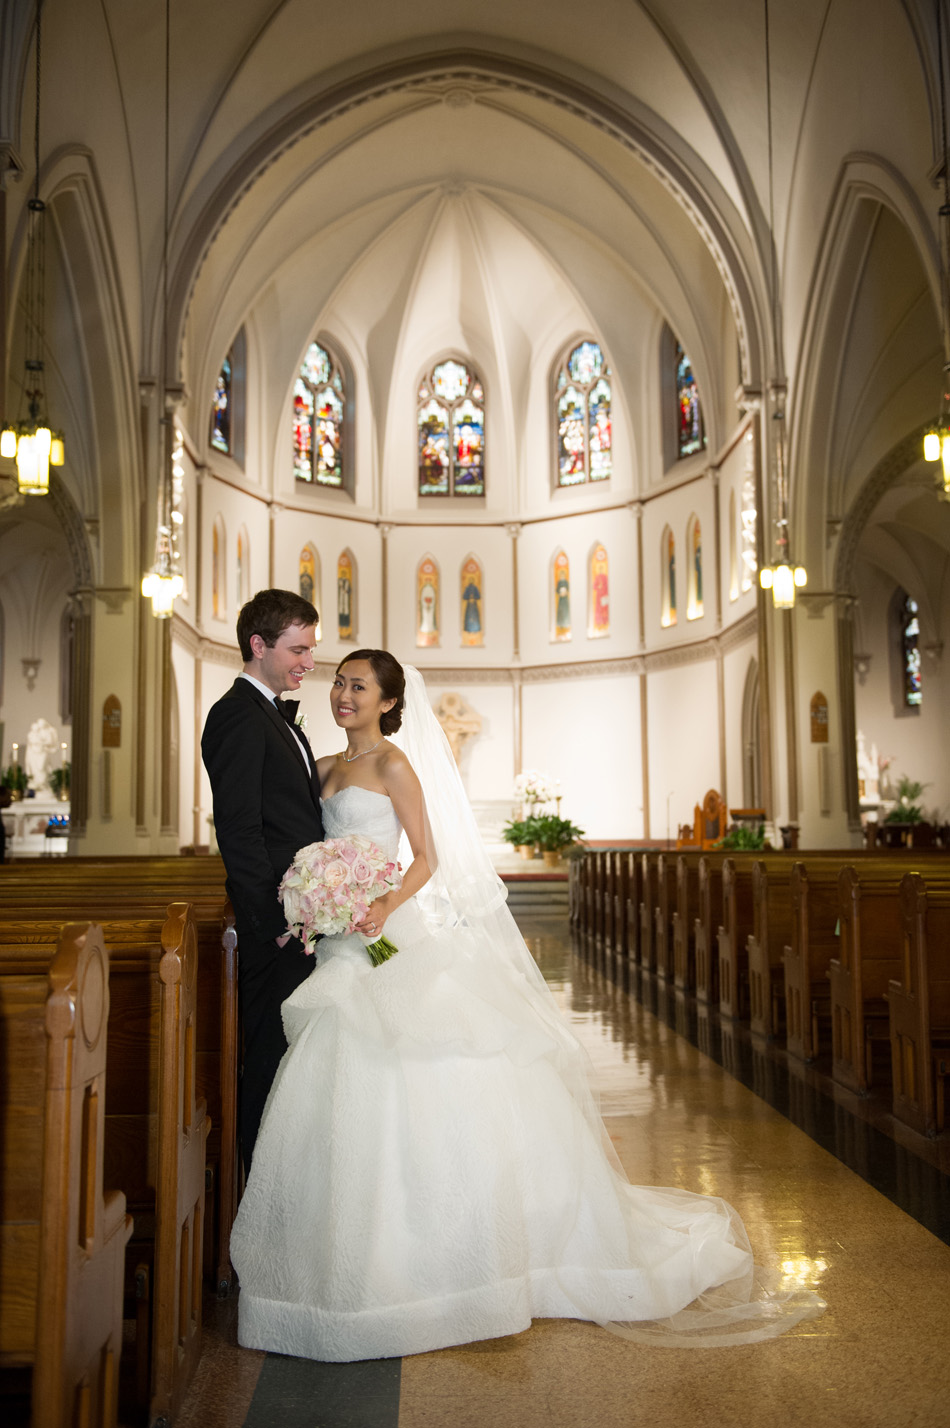 FreedPhotography_DC Wedding_015